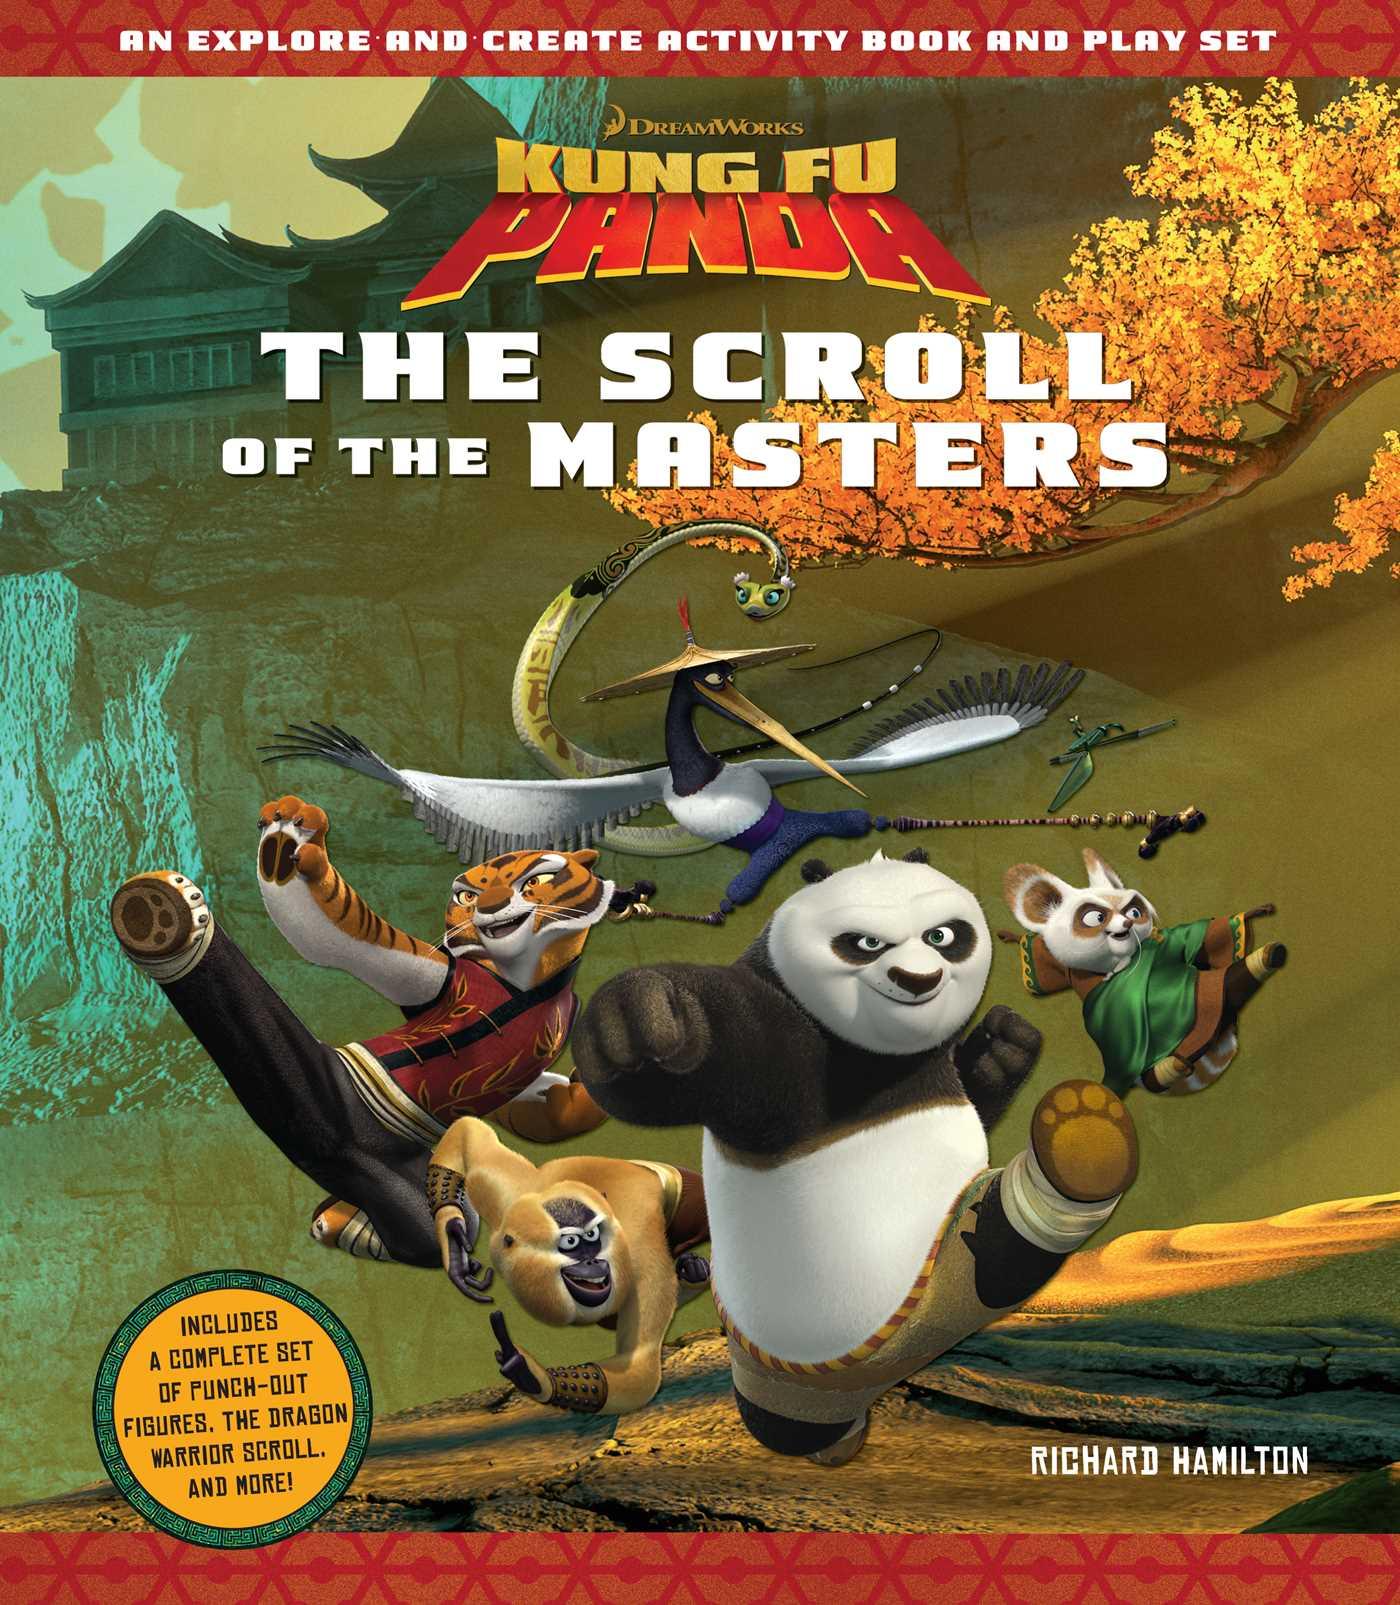 kung fu panda: the scroll of the masters | bookrichard hamilton